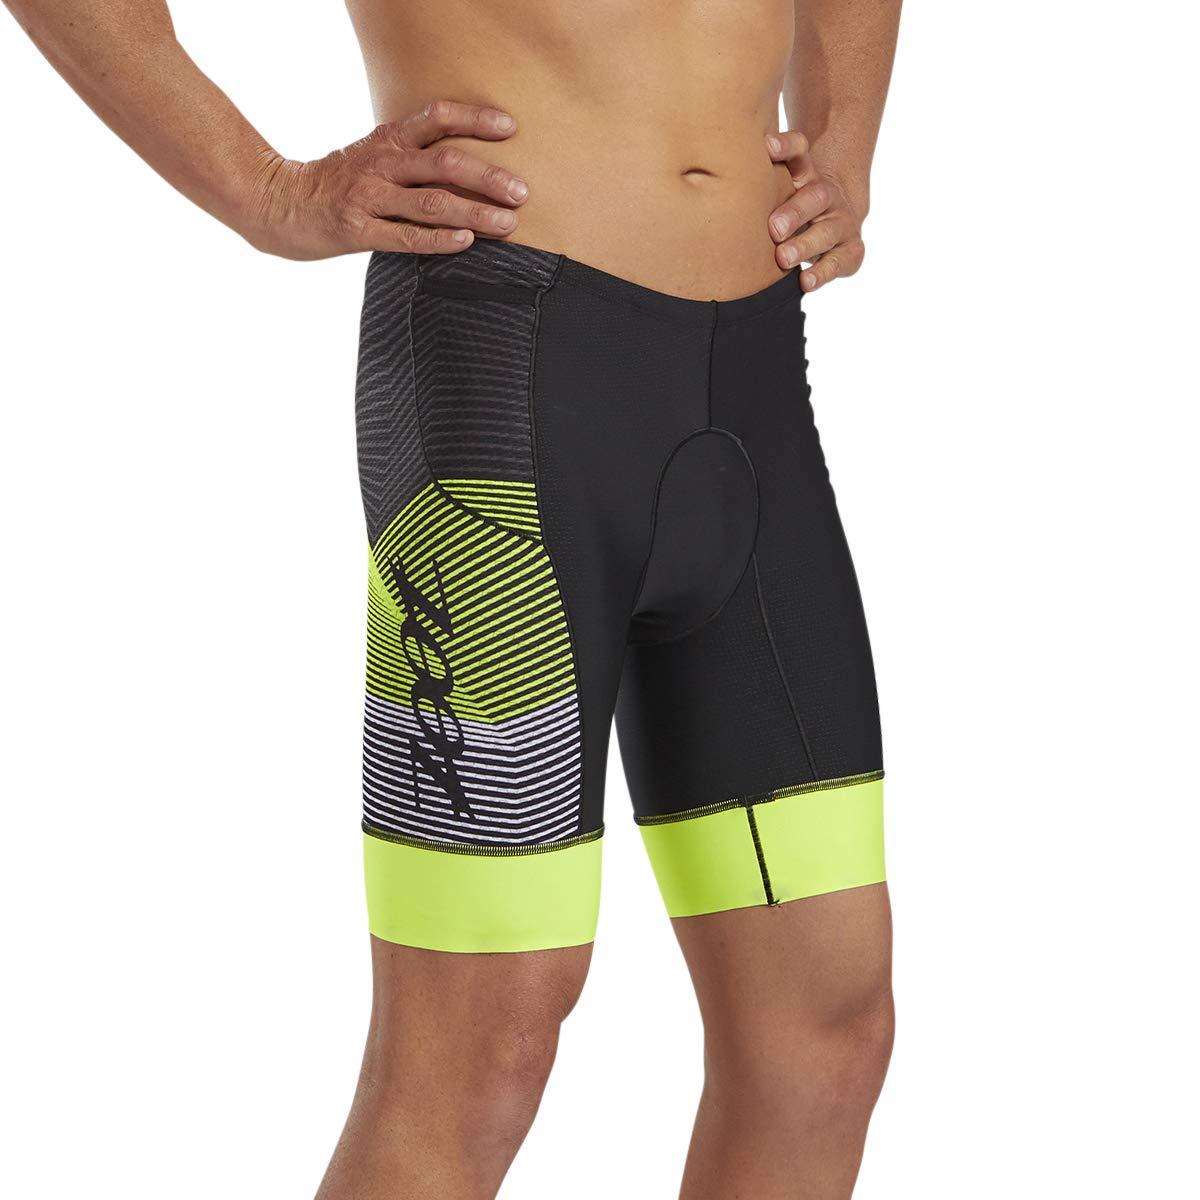 Zoot Ultra Mens 9-Inch Tri Shorts Performance Triathlon Shorts Carbon Fabric Hip Holster Pockets